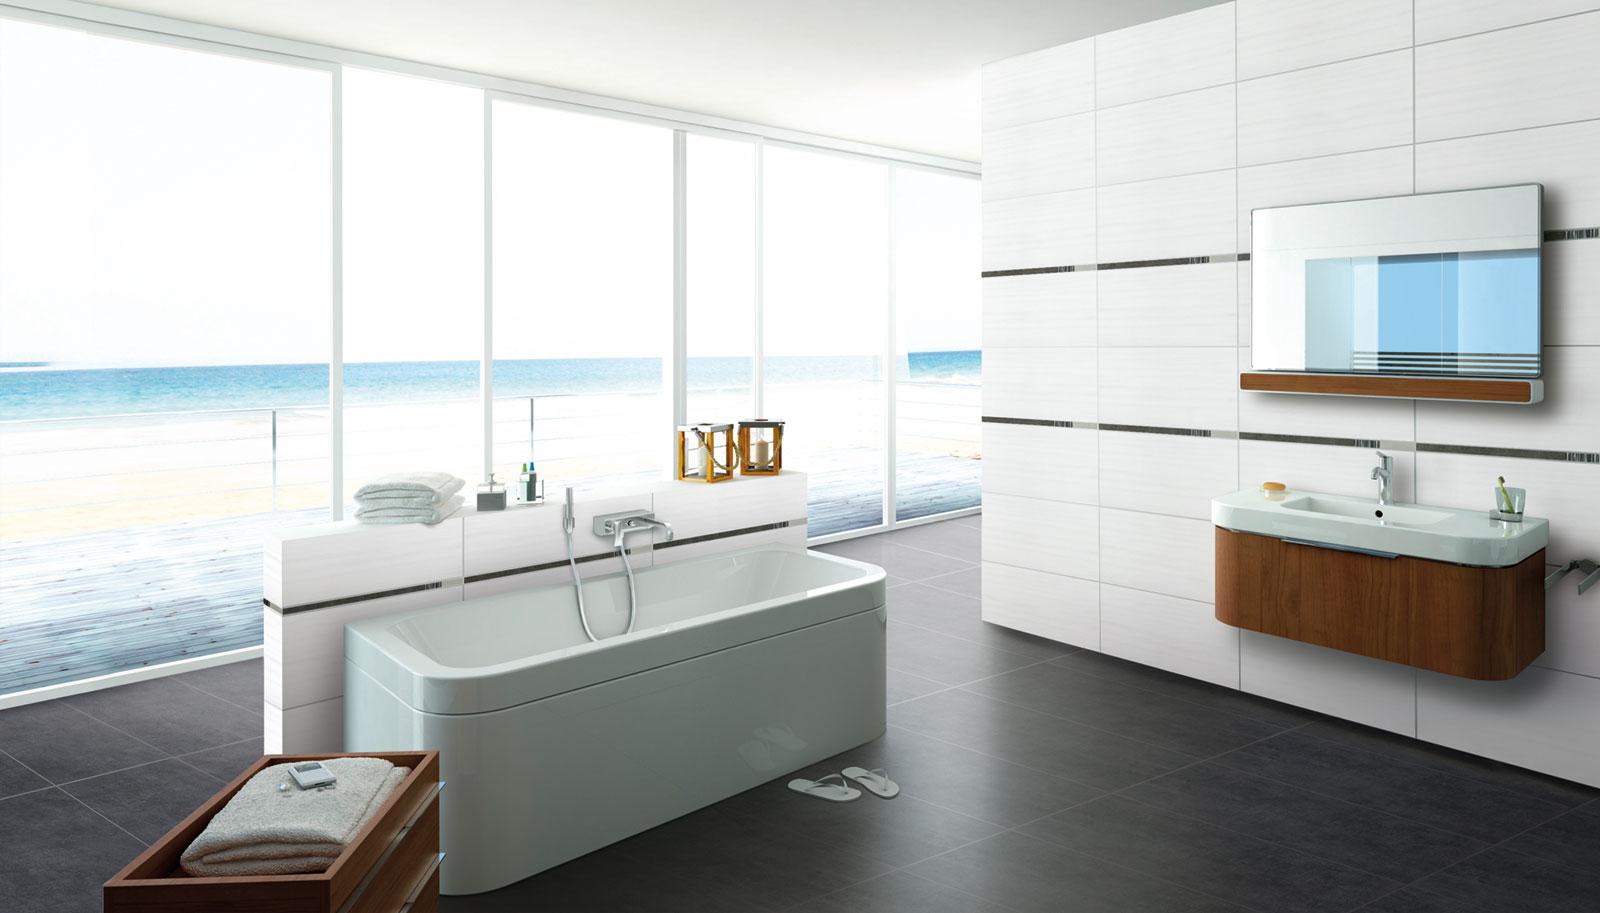 fliesen linnenbecker gmbh baustoffhandel fliesenhandel holzhandel. Black Bedroom Furniture Sets. Home Design Ideas